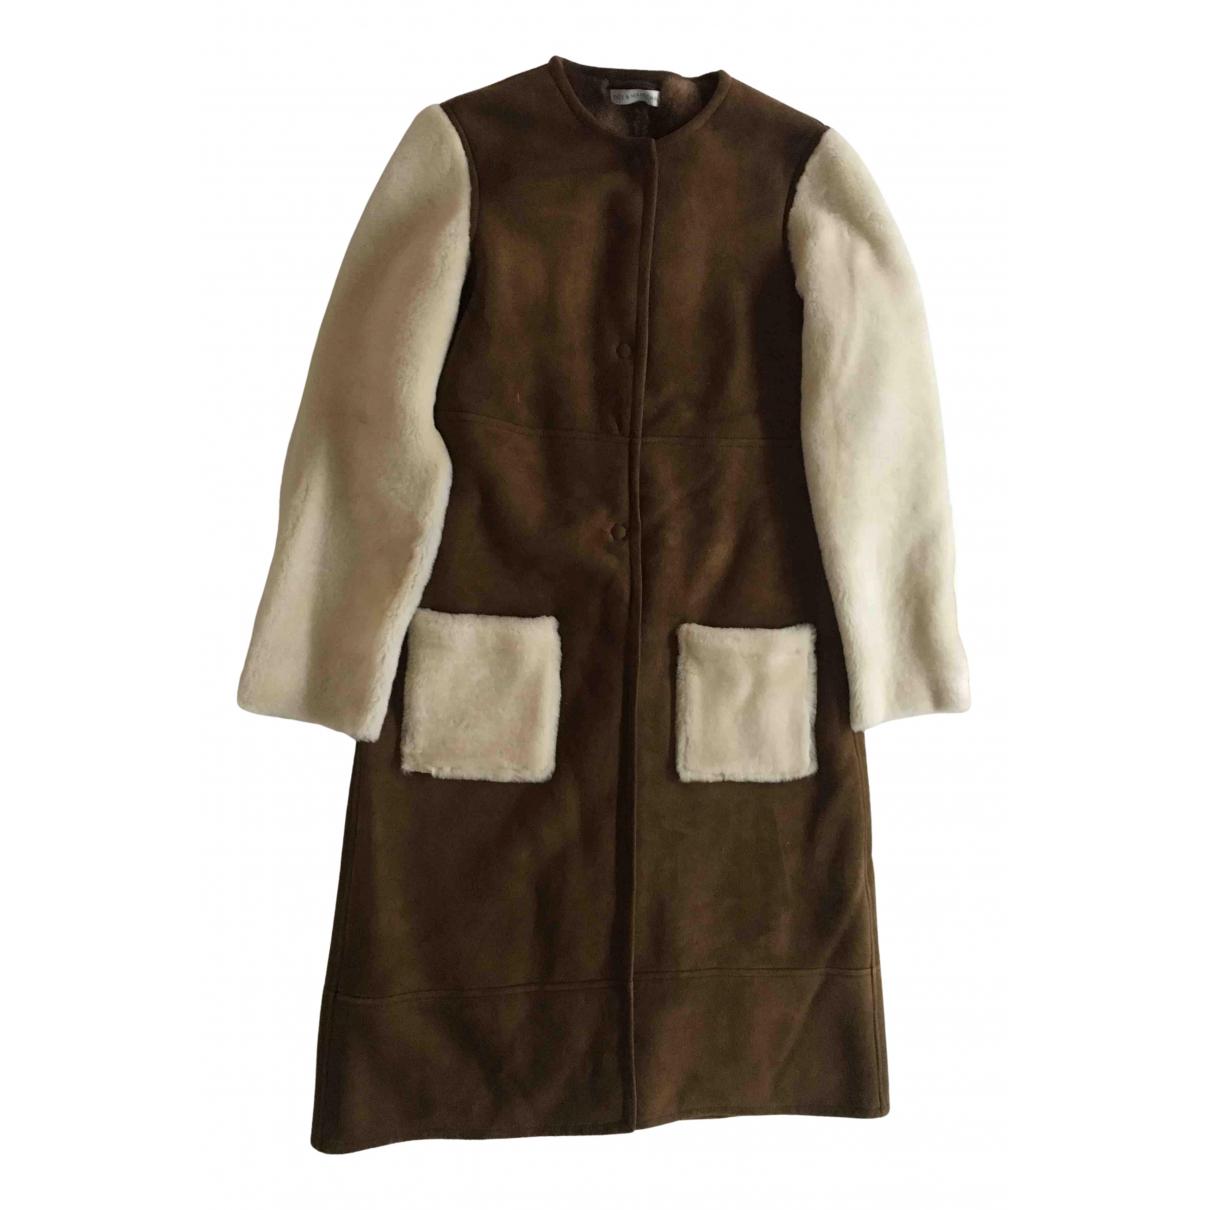 Ines Et Marechal N Brown Mongolian Lamb Leather jacket for Women 40 FR